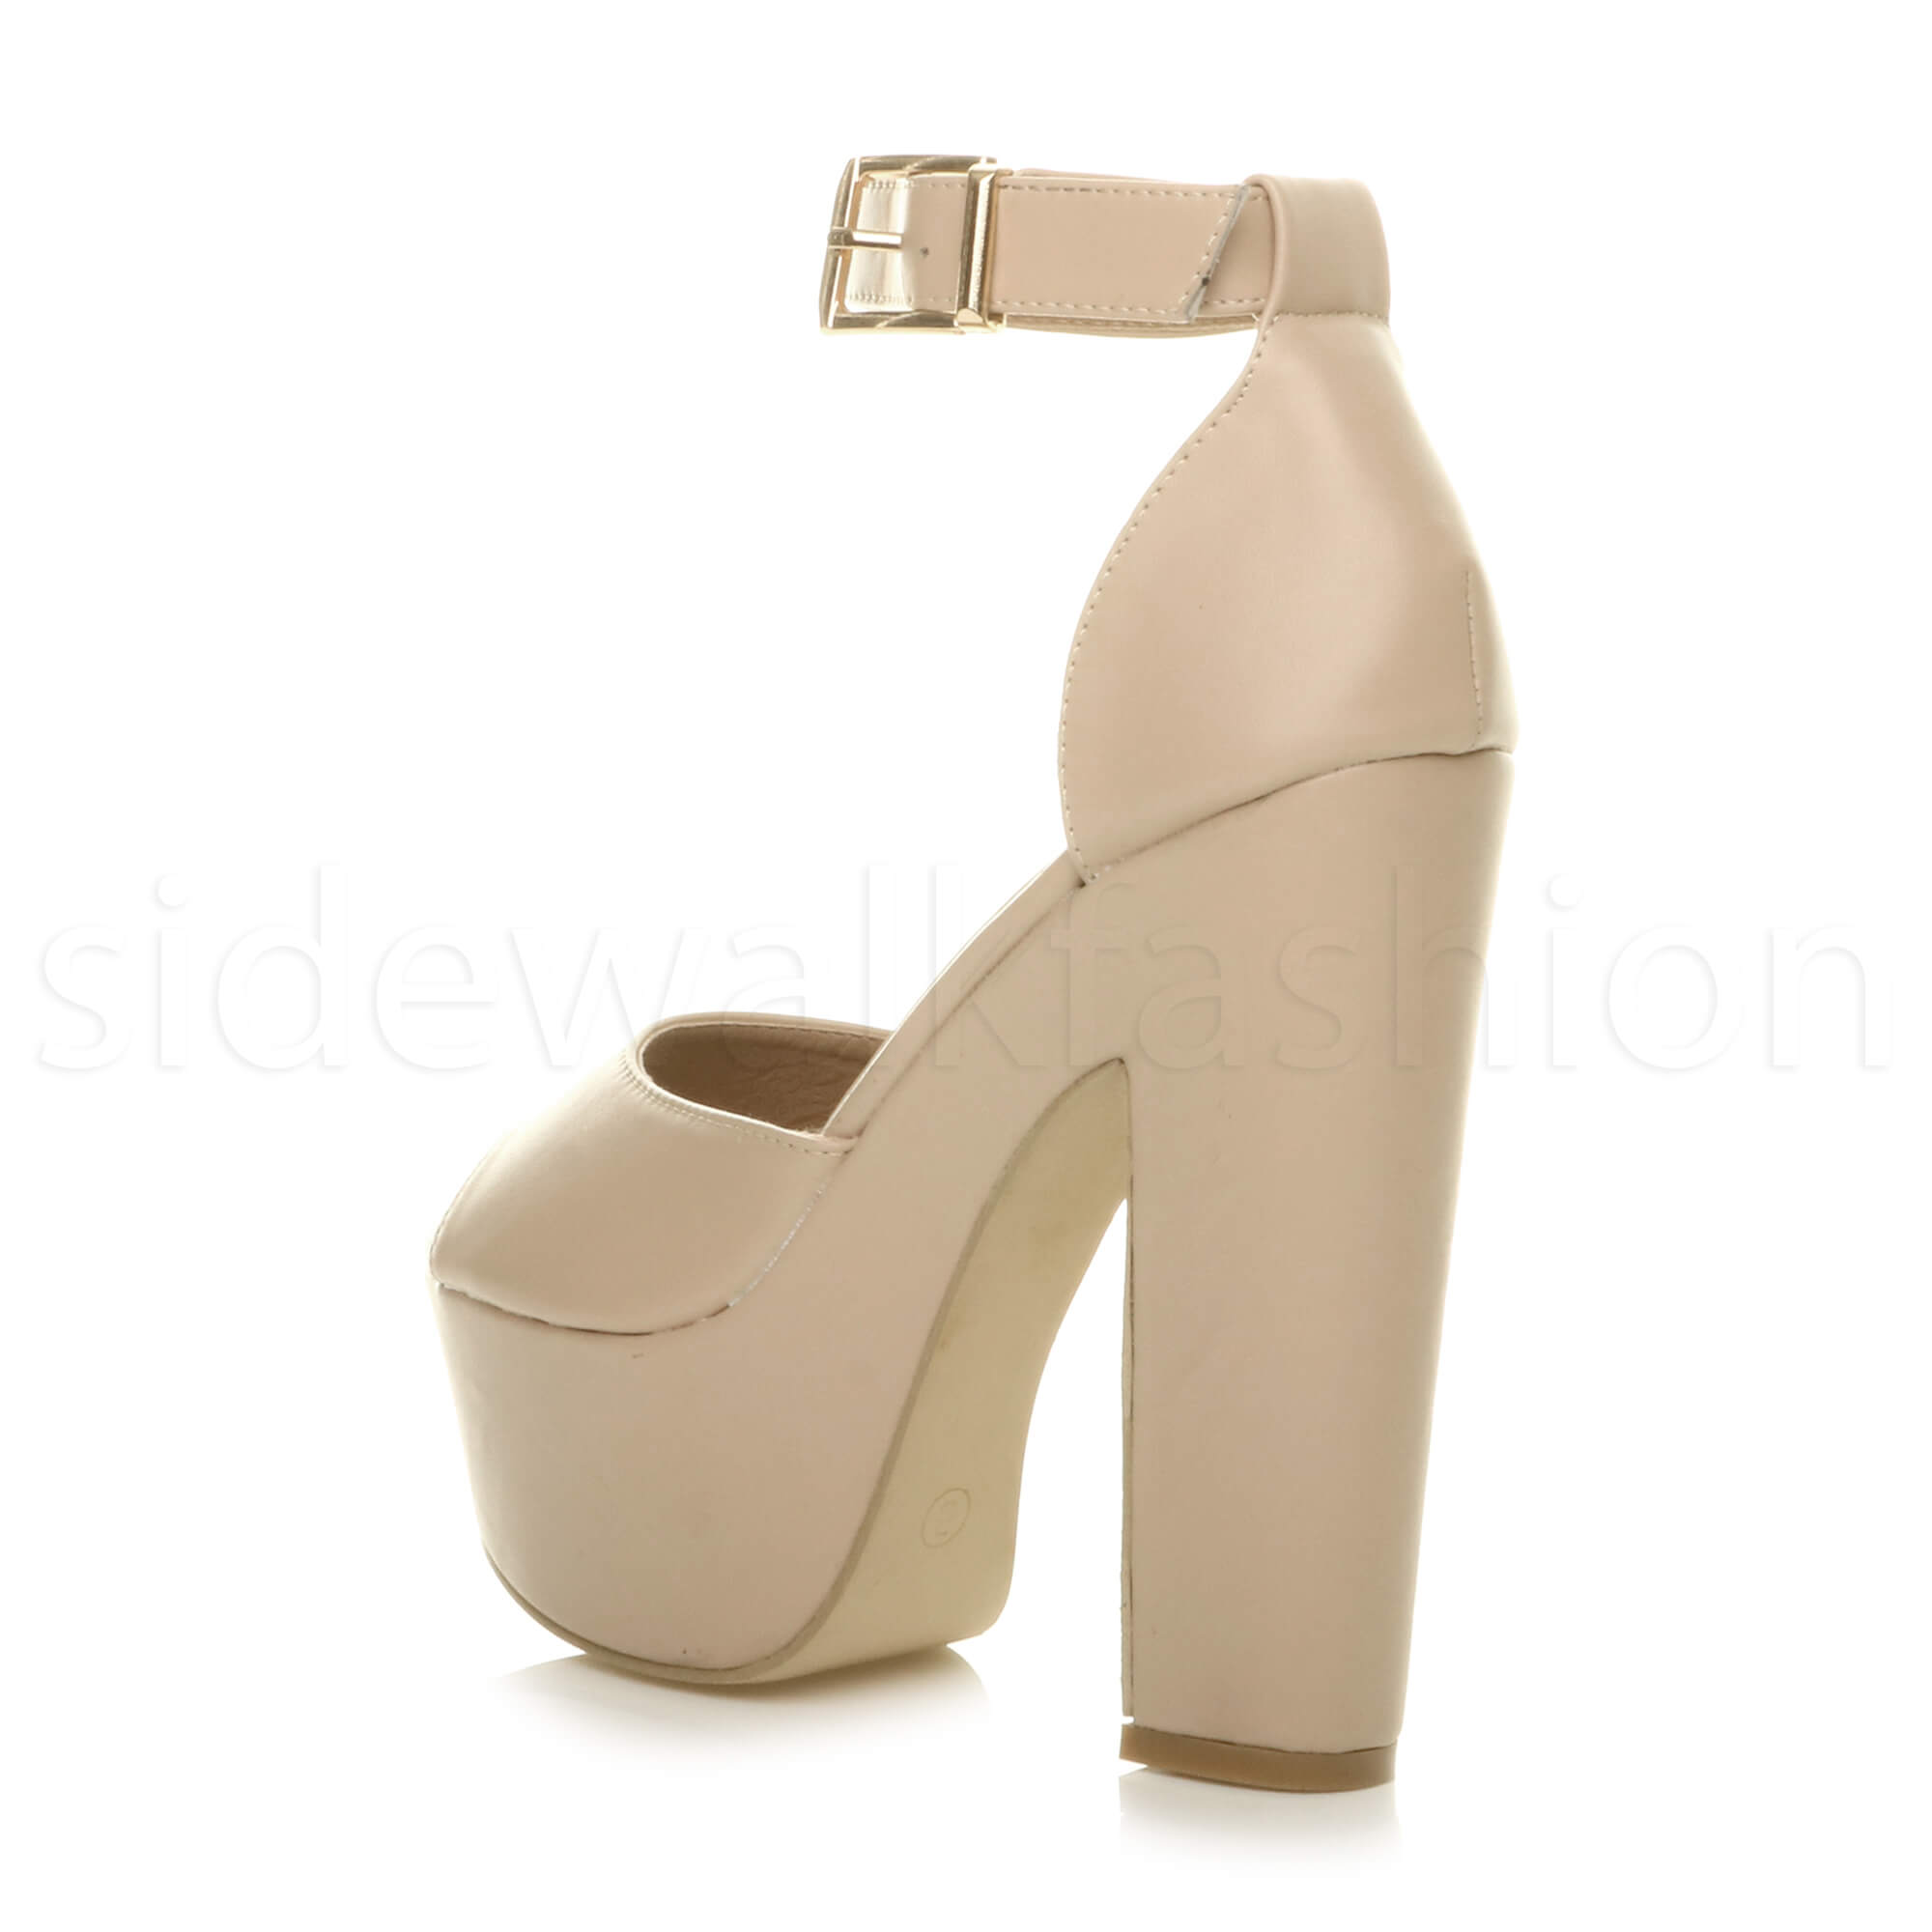 Womens-ladies-high-block-heel-peep-toe-shoes-evening-party-platform-sandals-size thumbnail 20